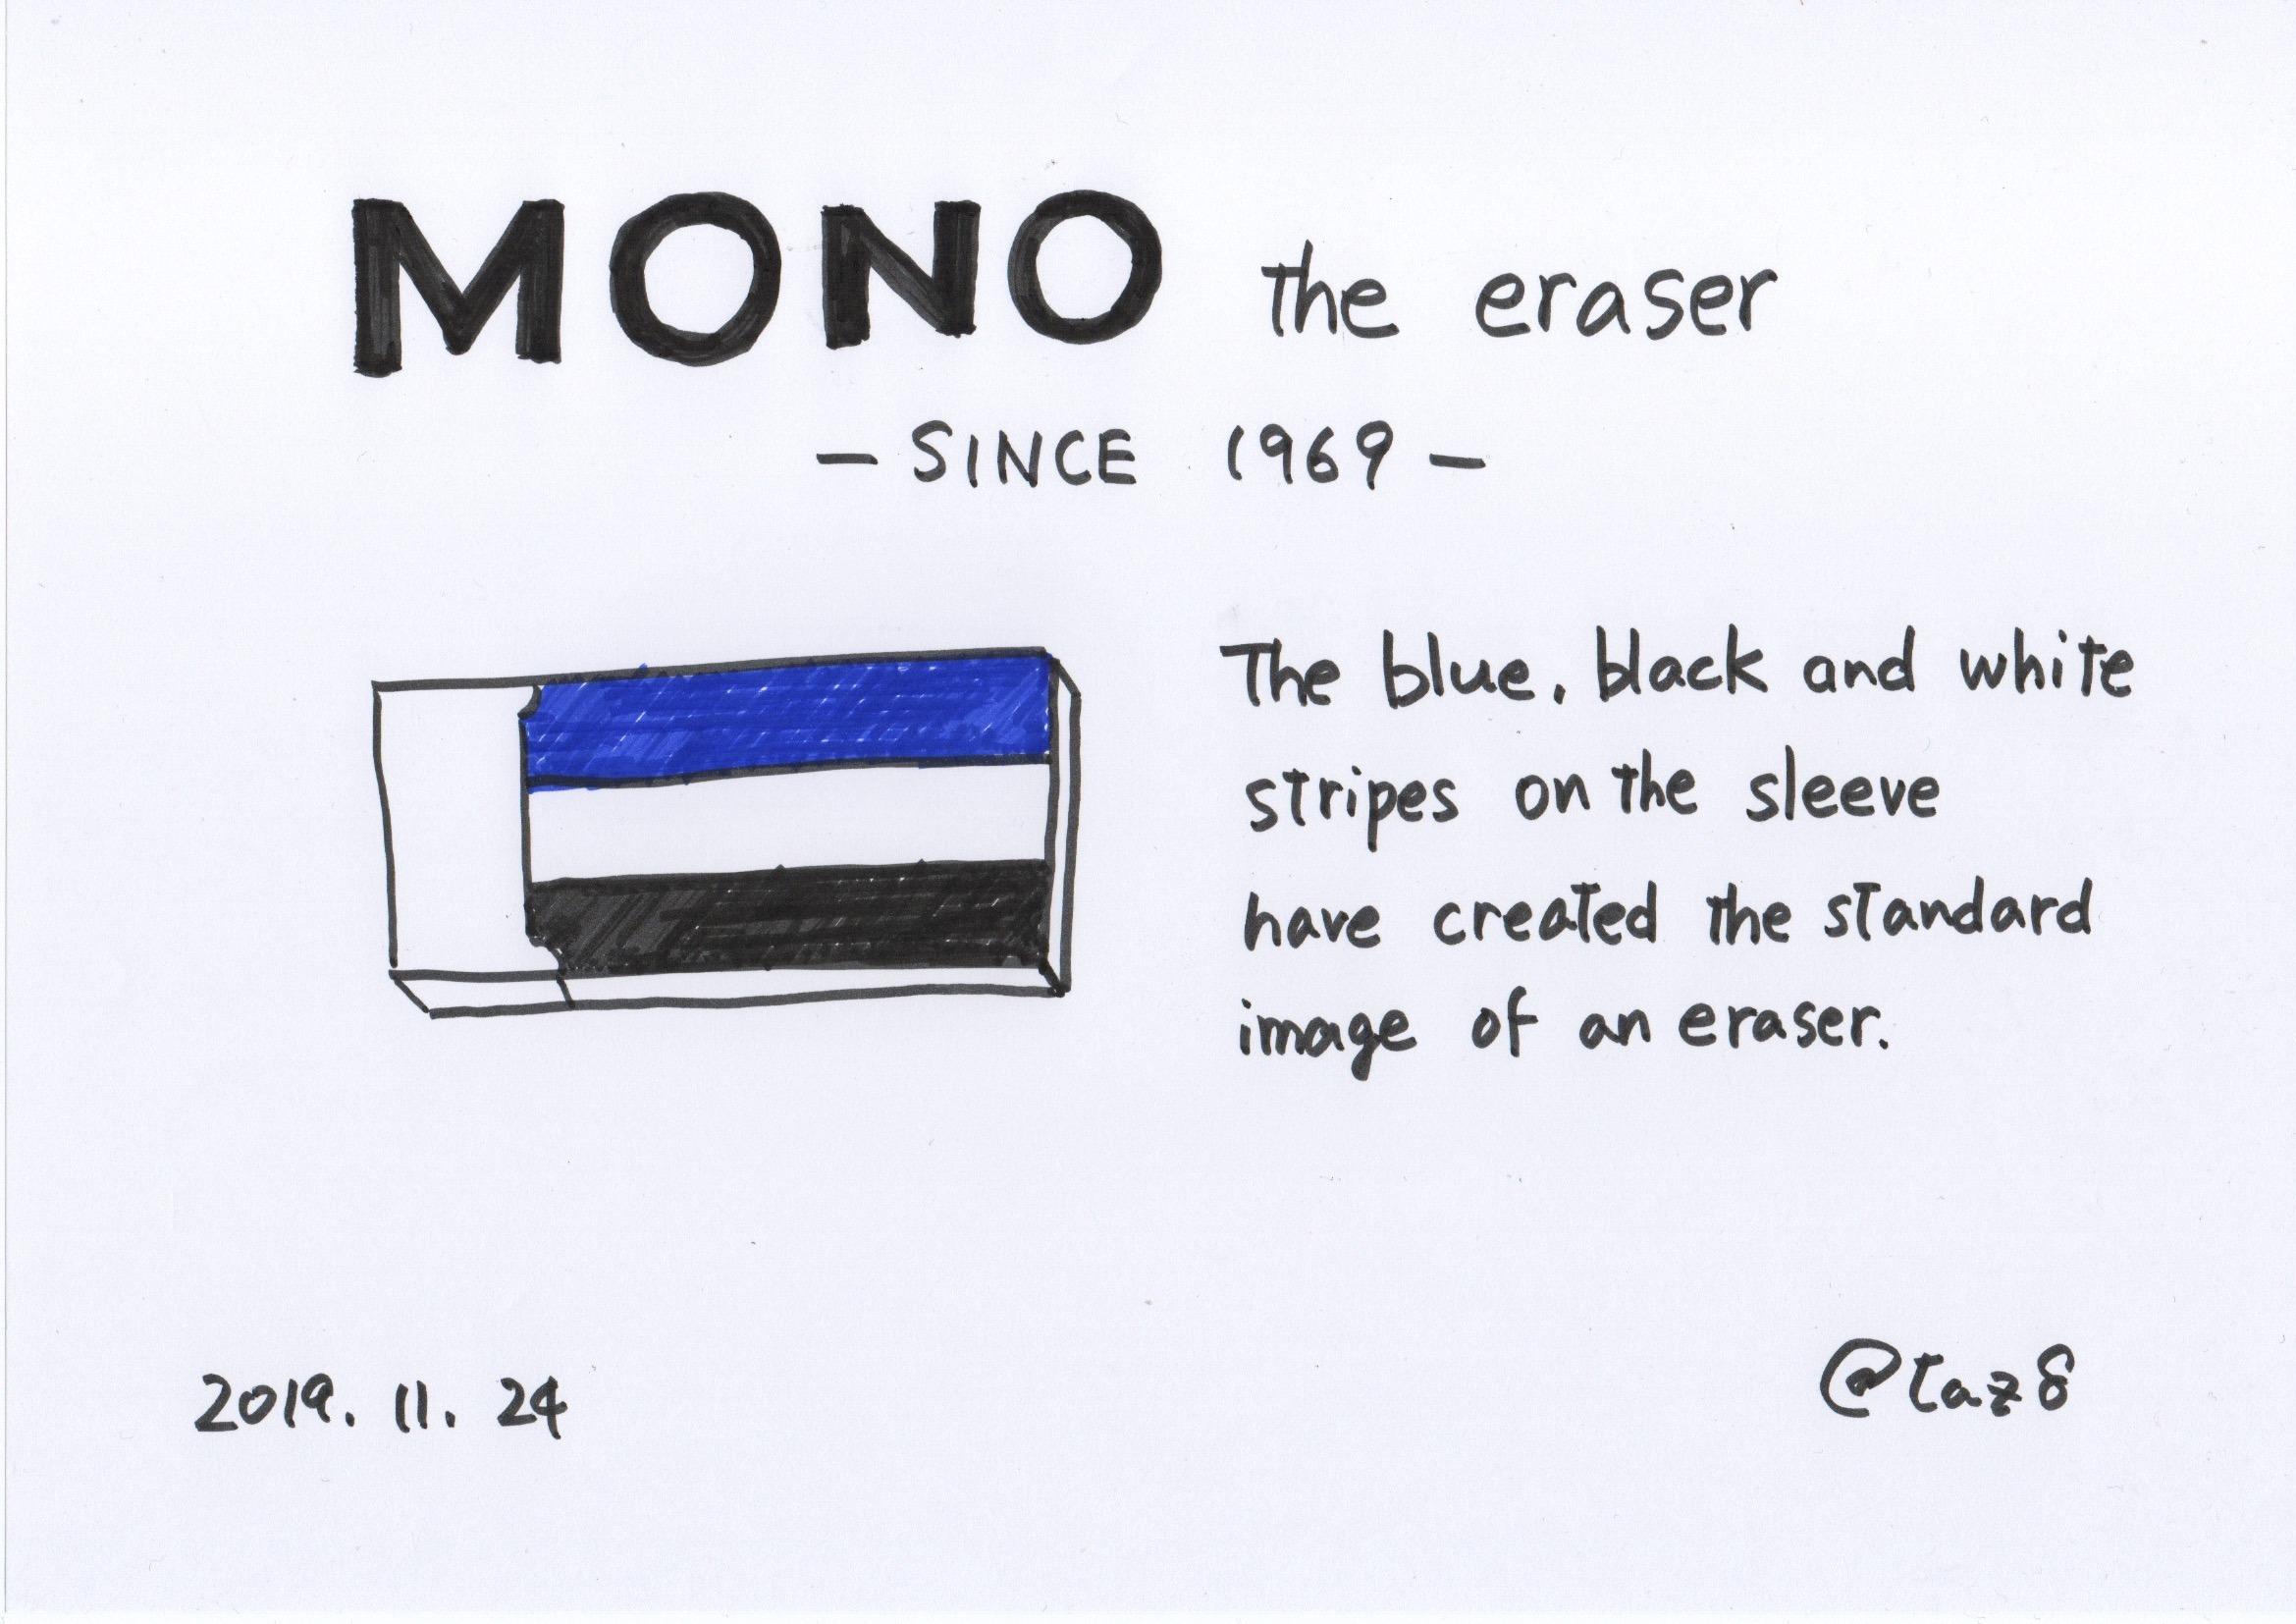 MONO the eraser Image